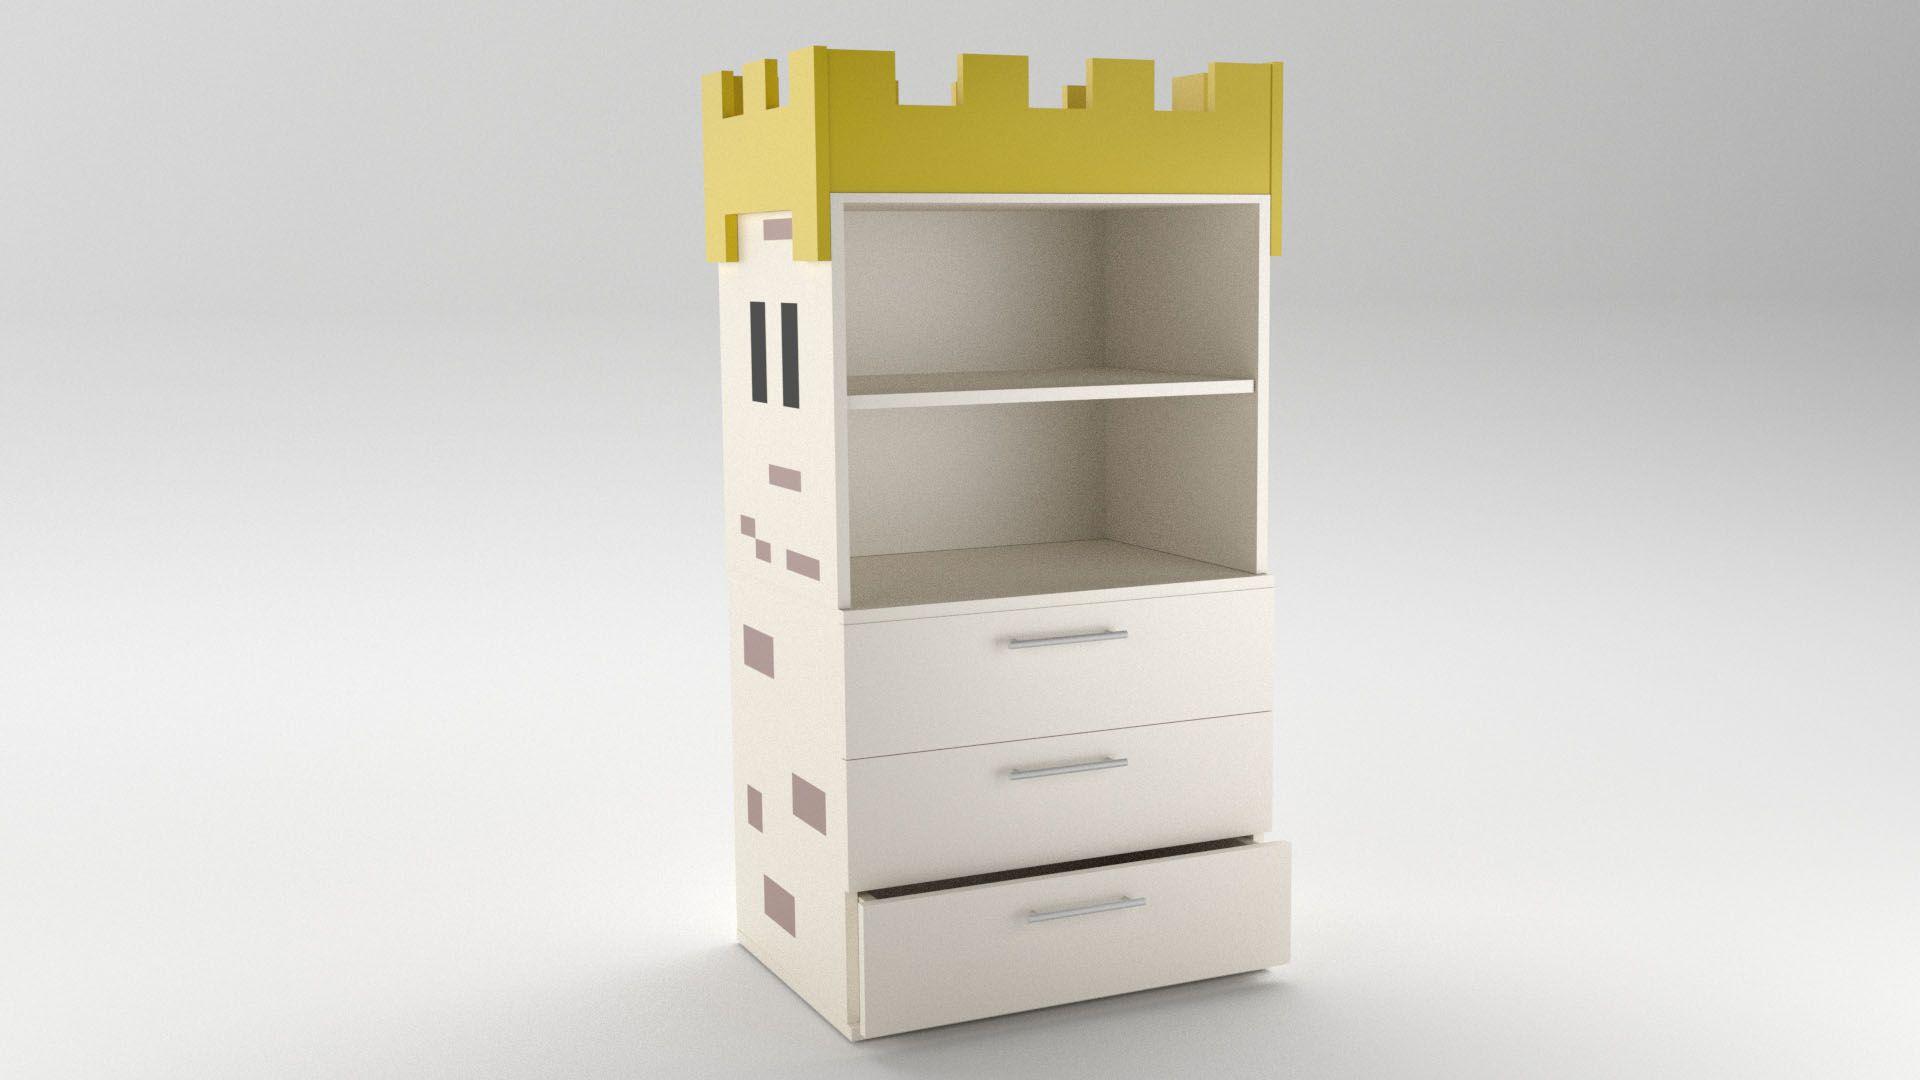 Model Camelot CabinetShelf Vista 1